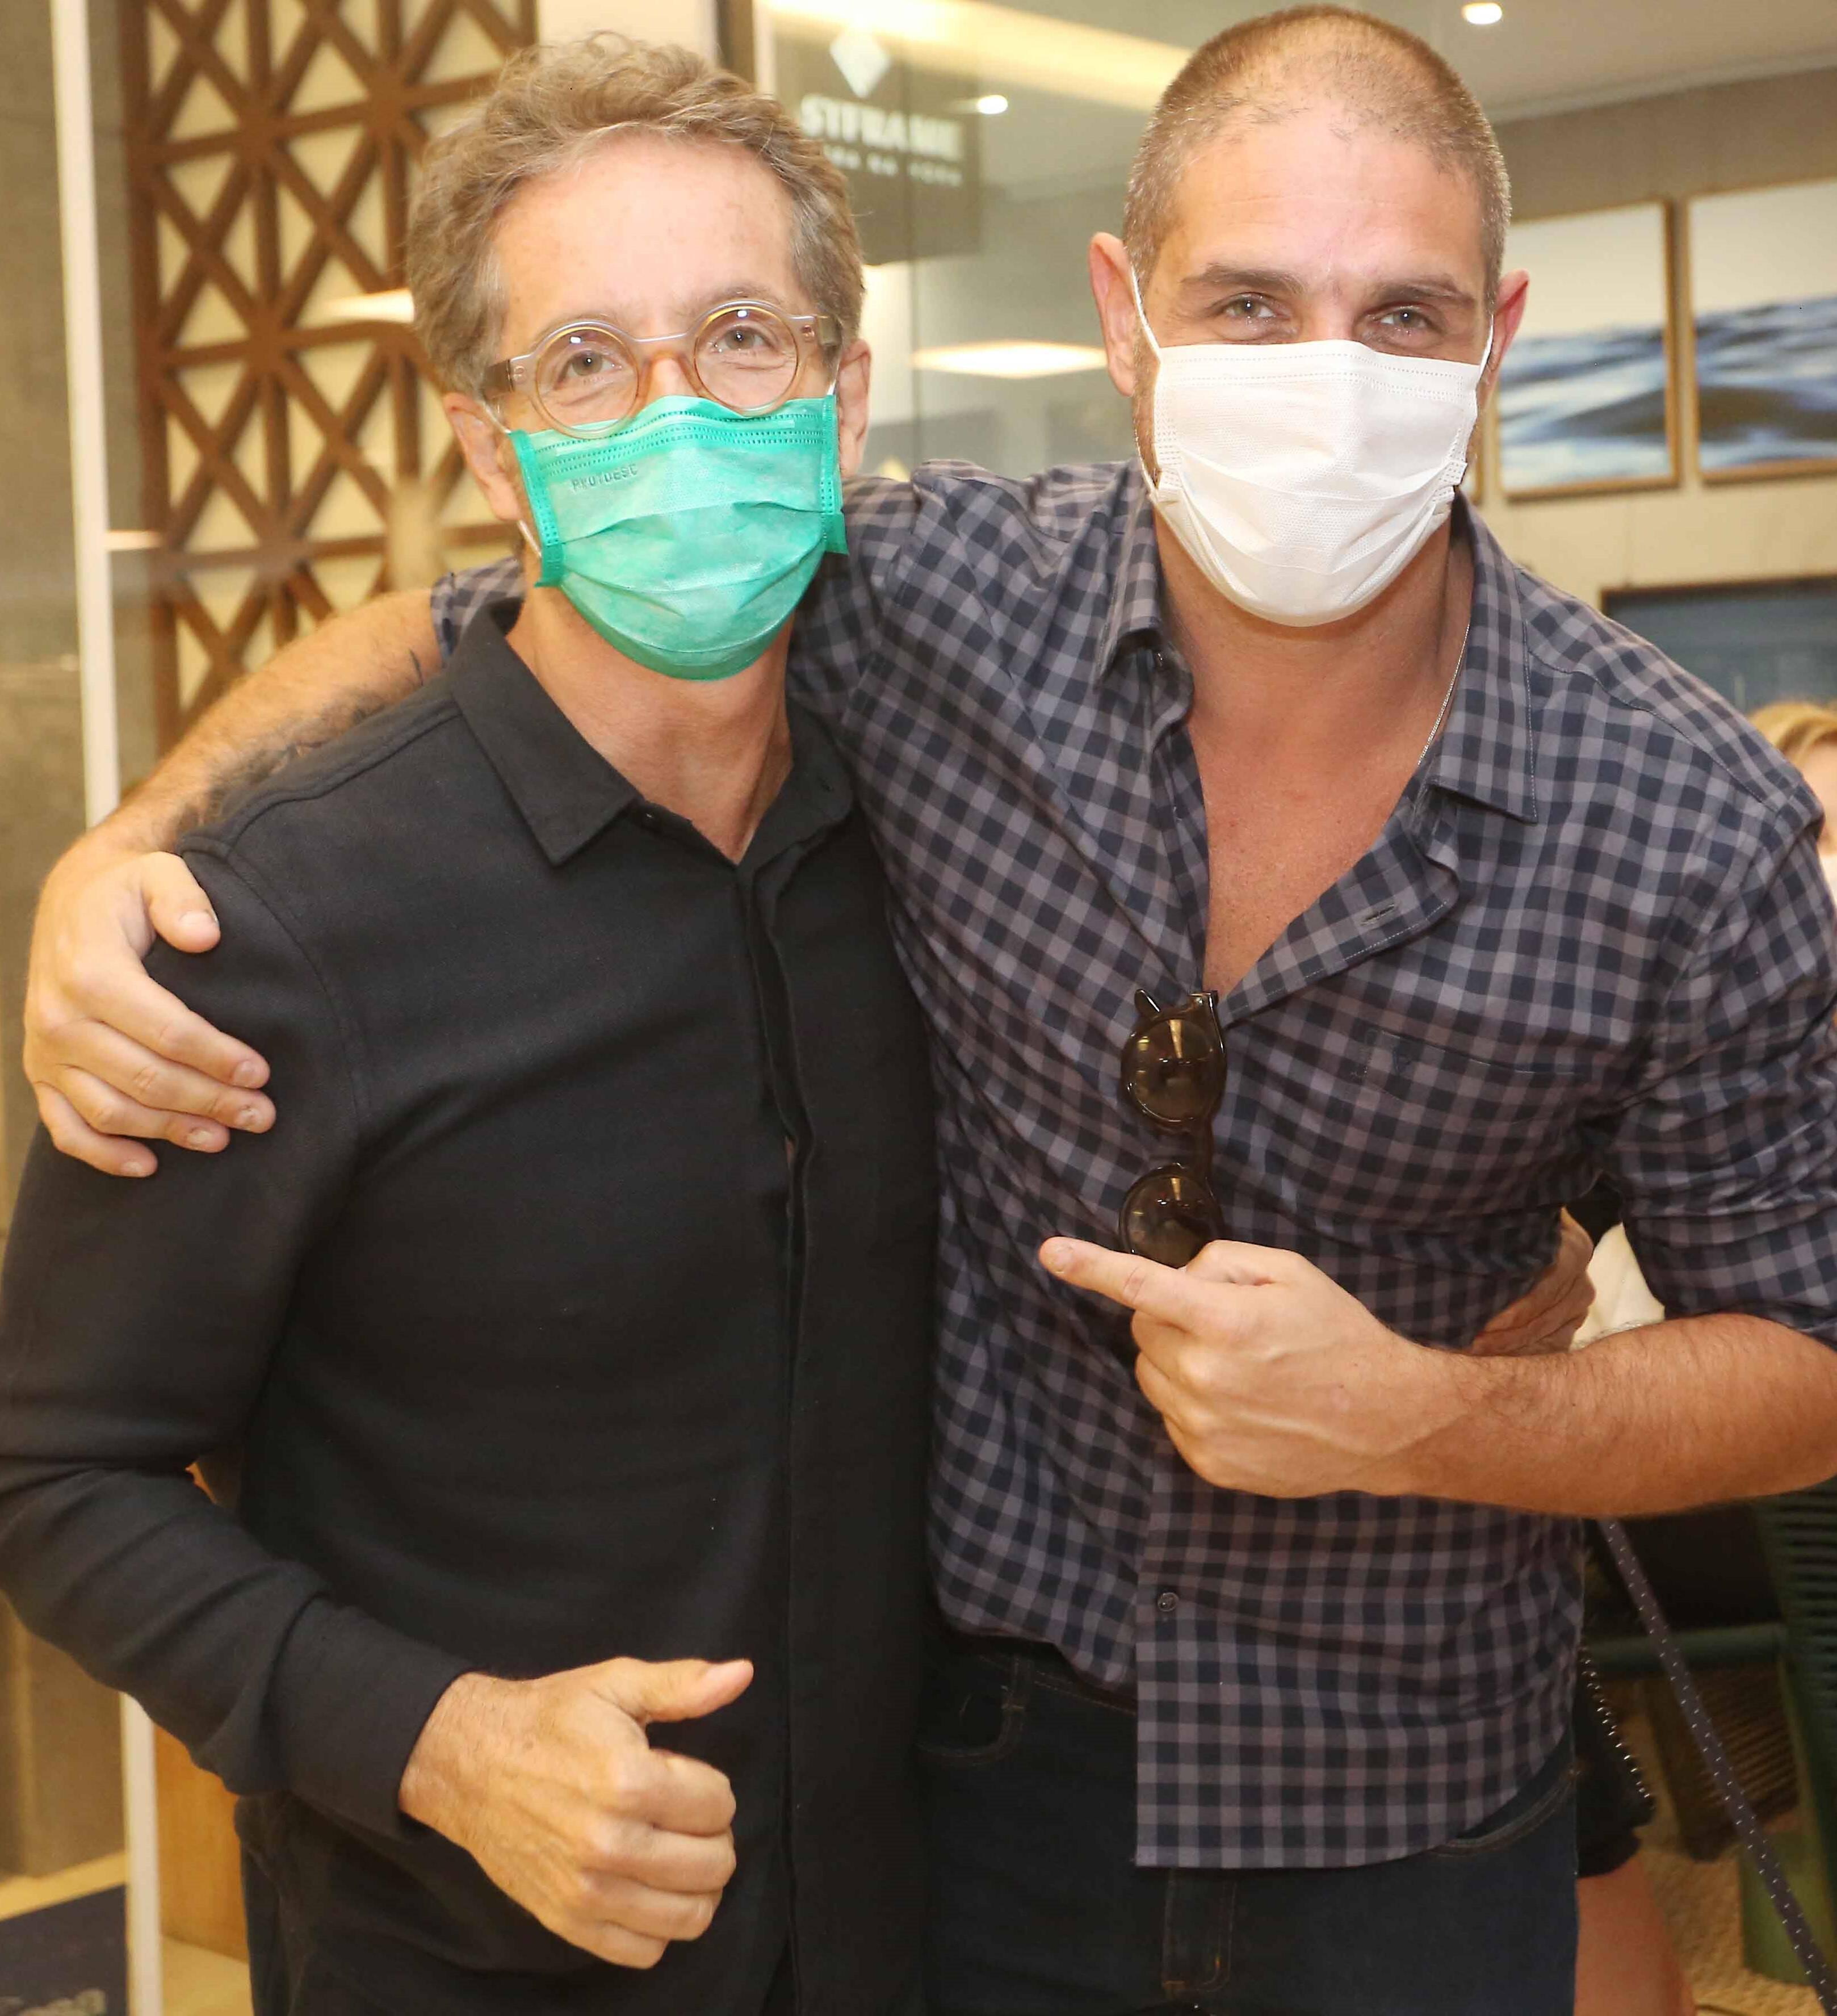 Pedro Guimarães e Ari Kaye /Foto: Reginaldo Teixeira